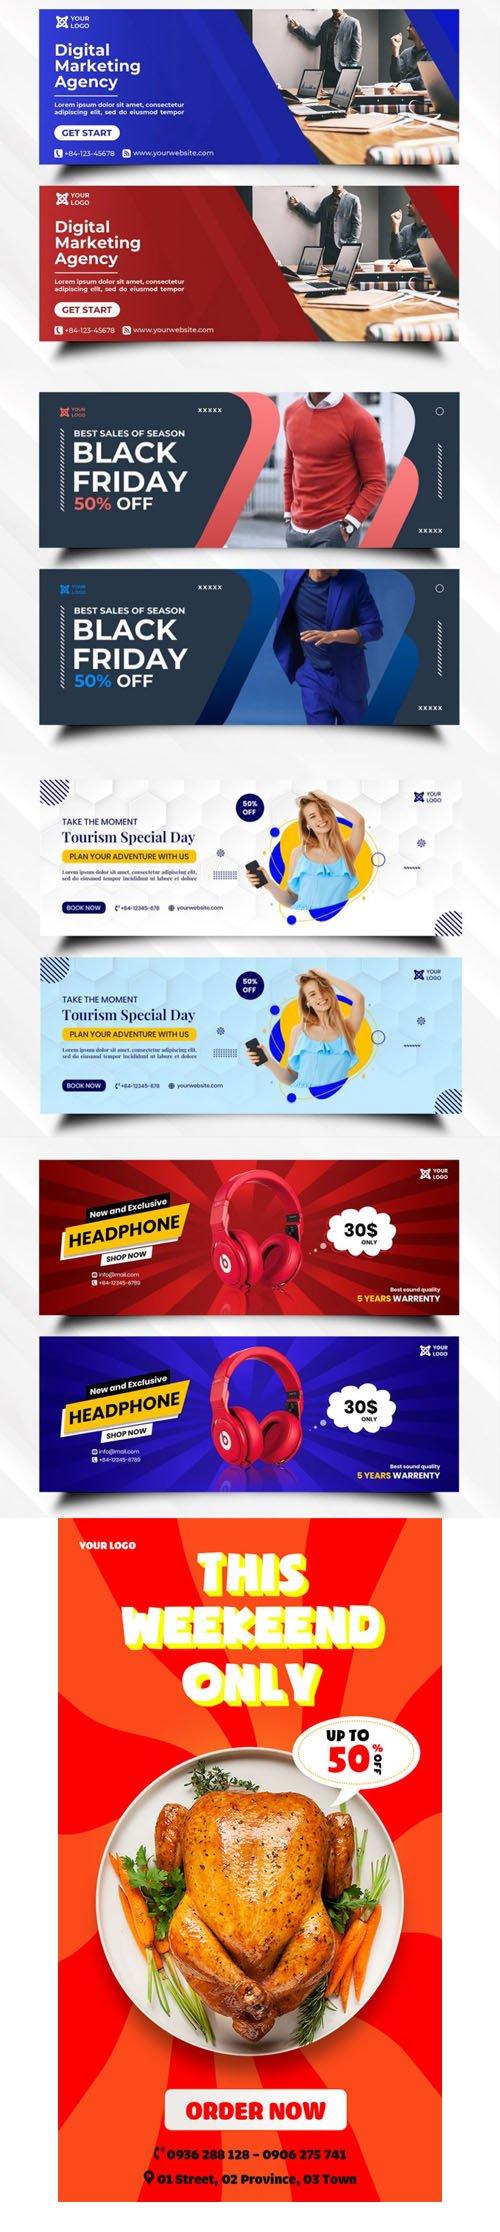 Social Media Ad Banners PSD Templates